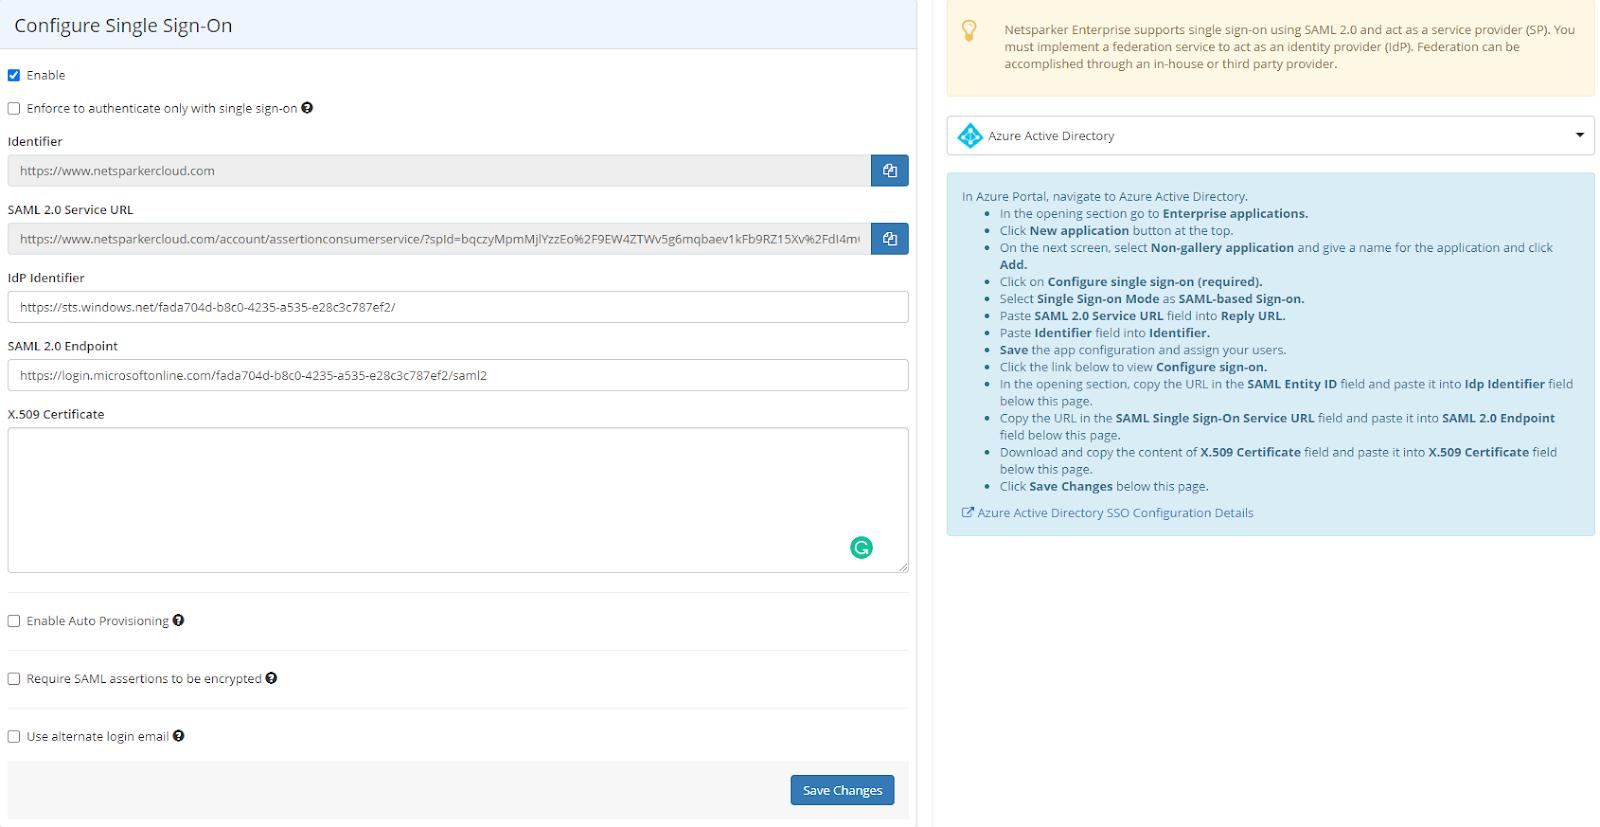 Configuring Sign-on in Netsparker Enterprise